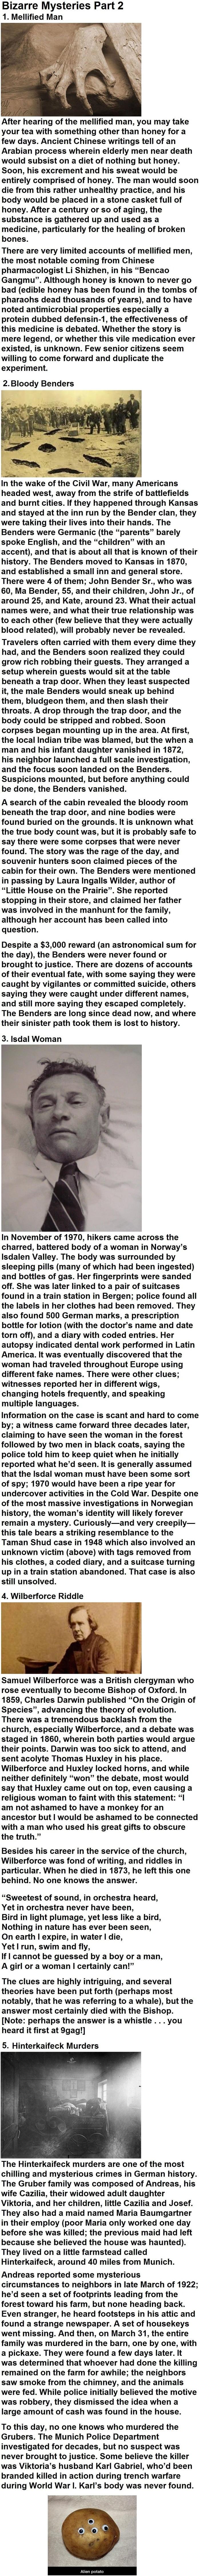 Bizarre Mysteries Part 2